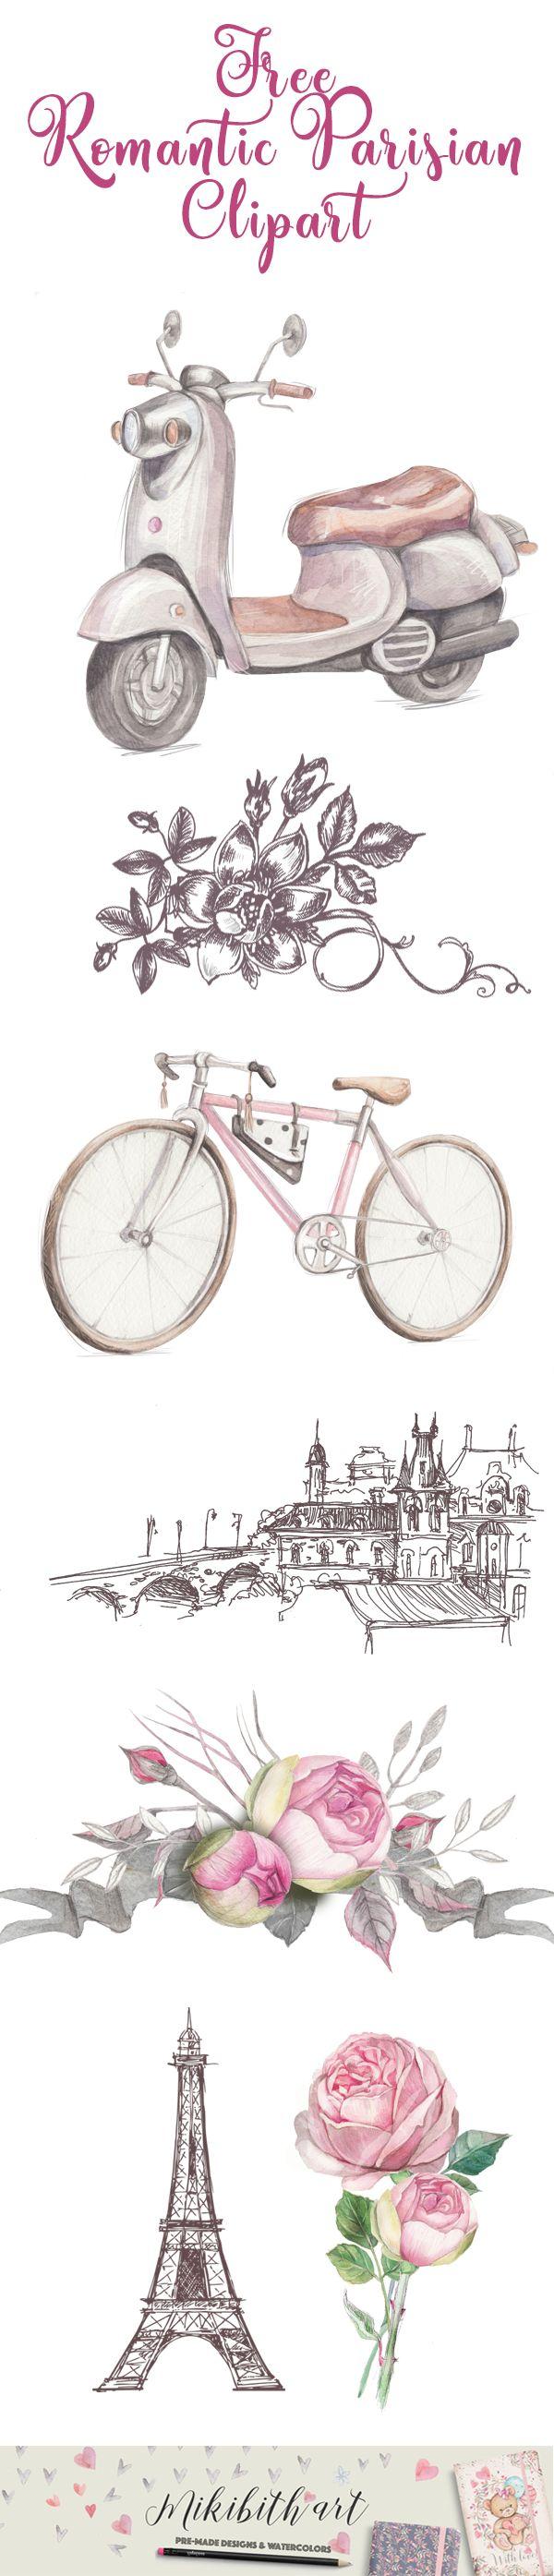 Free Romantic Parisian ClipArt